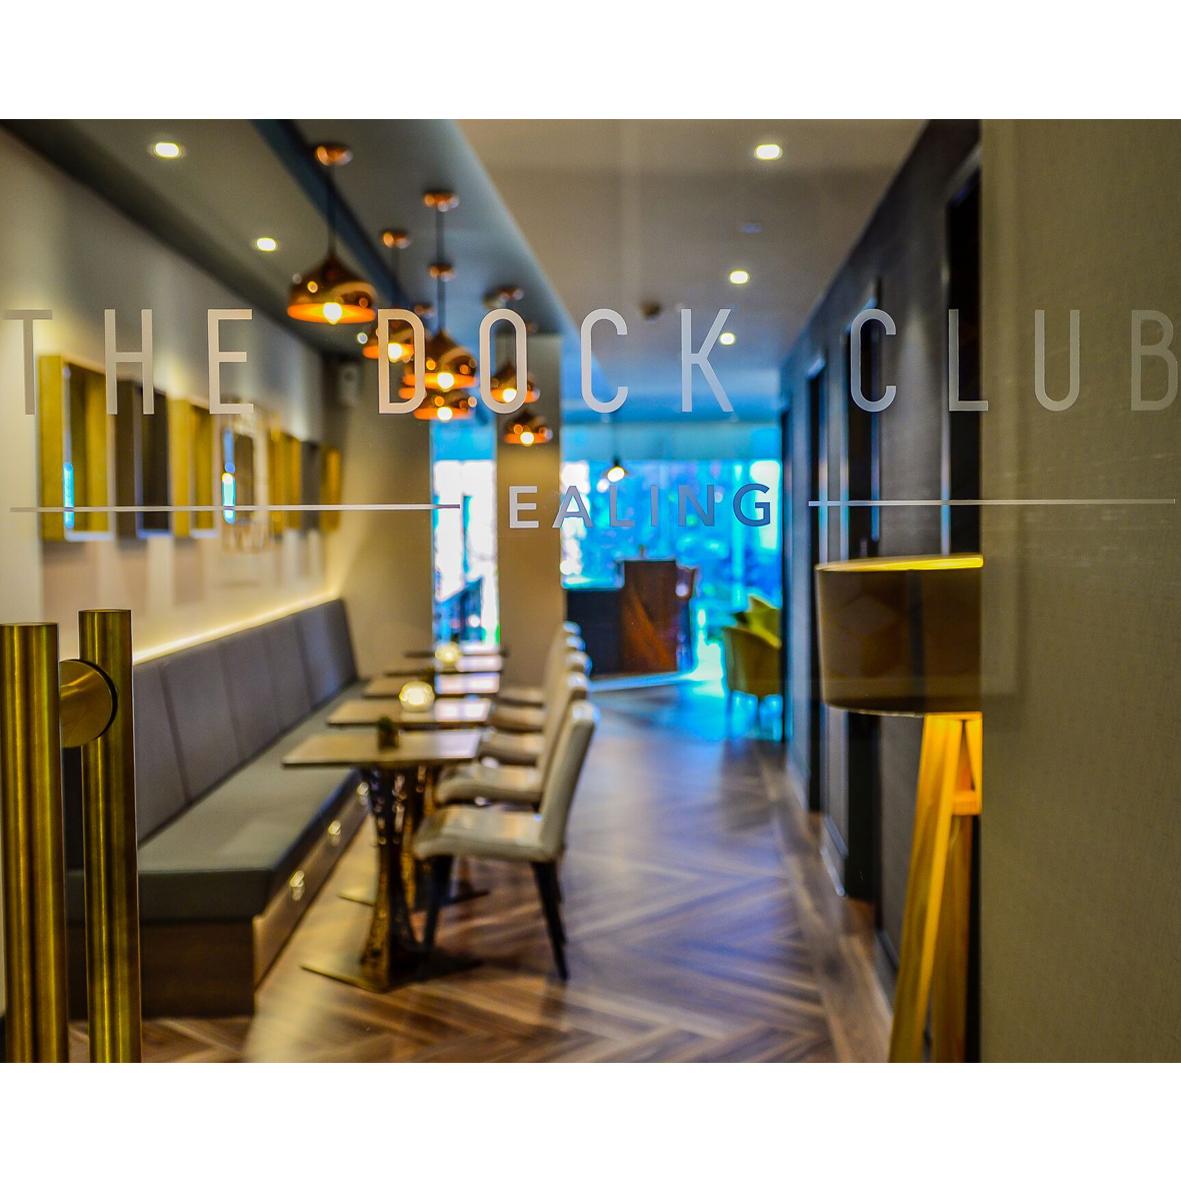 DOCK CLUB 5